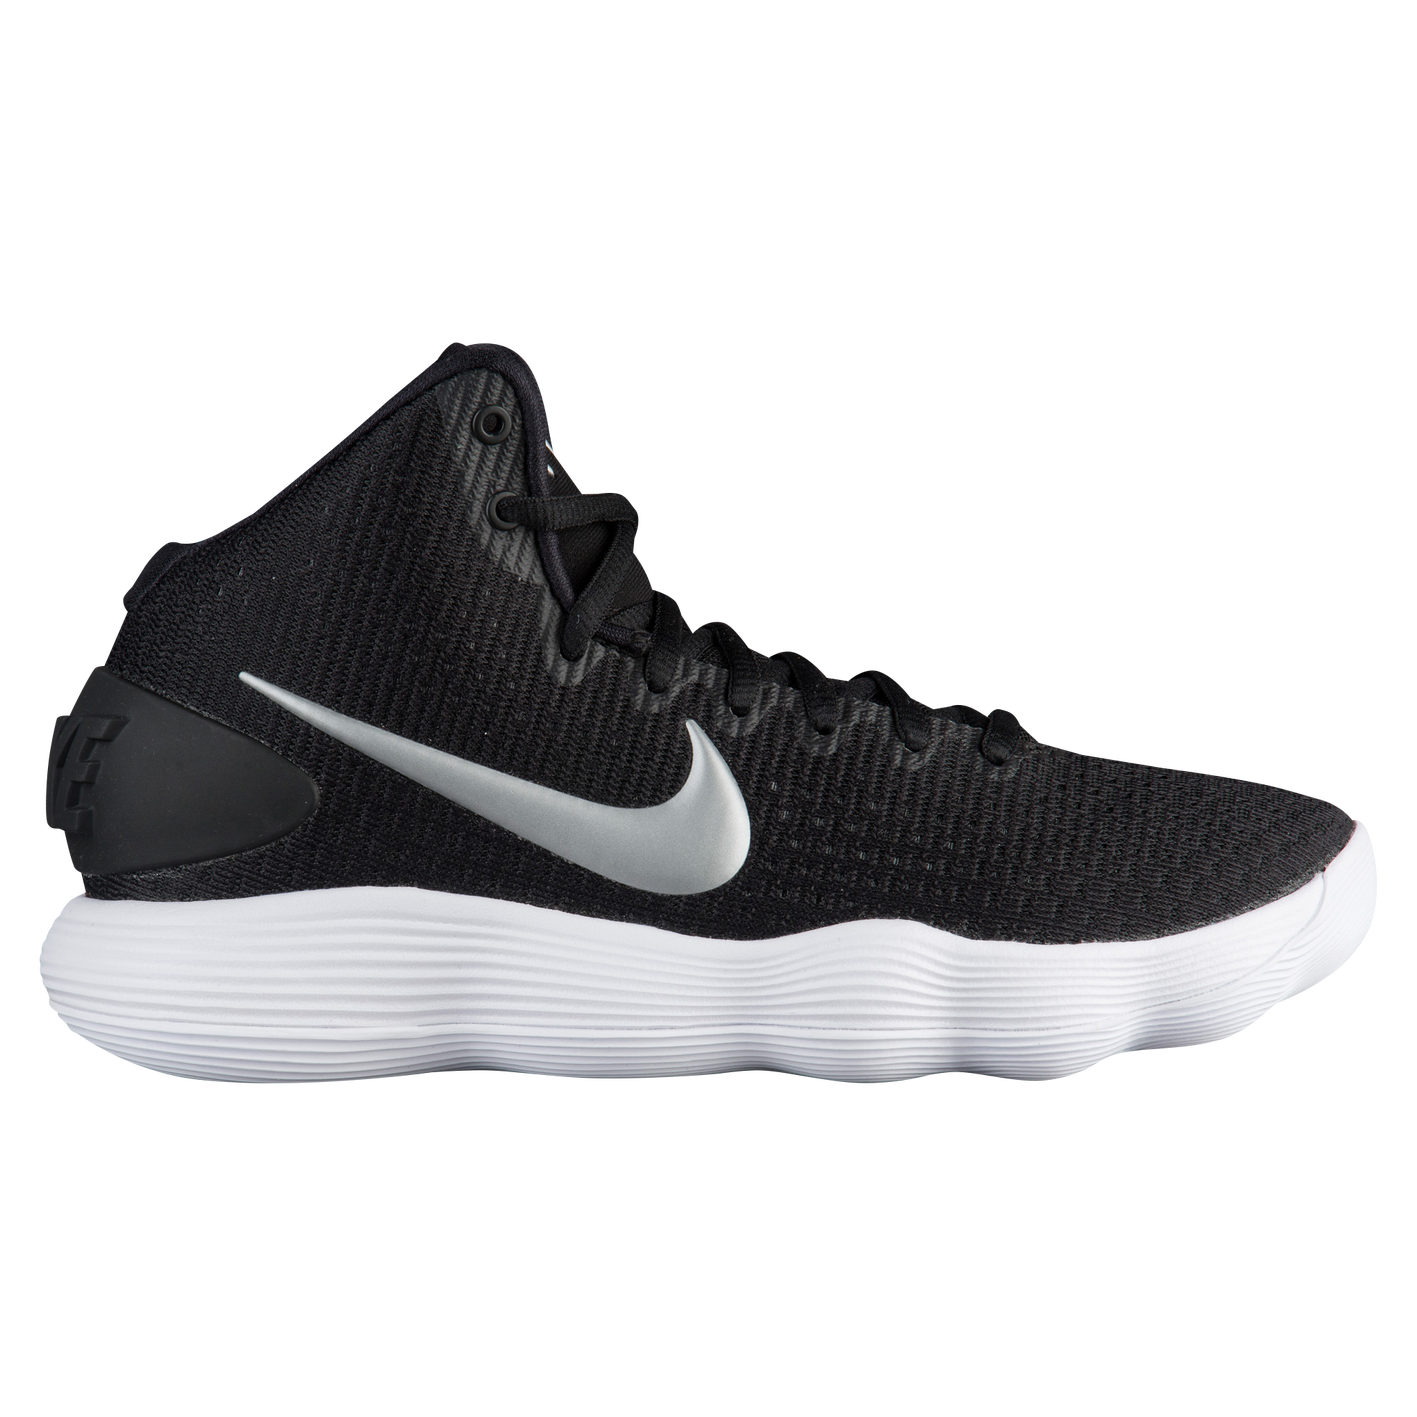 brand new 98eeb 249e6 Nike React Hyperdunk 2017 Mid - Women's - Basketball - Shoes - Black ...